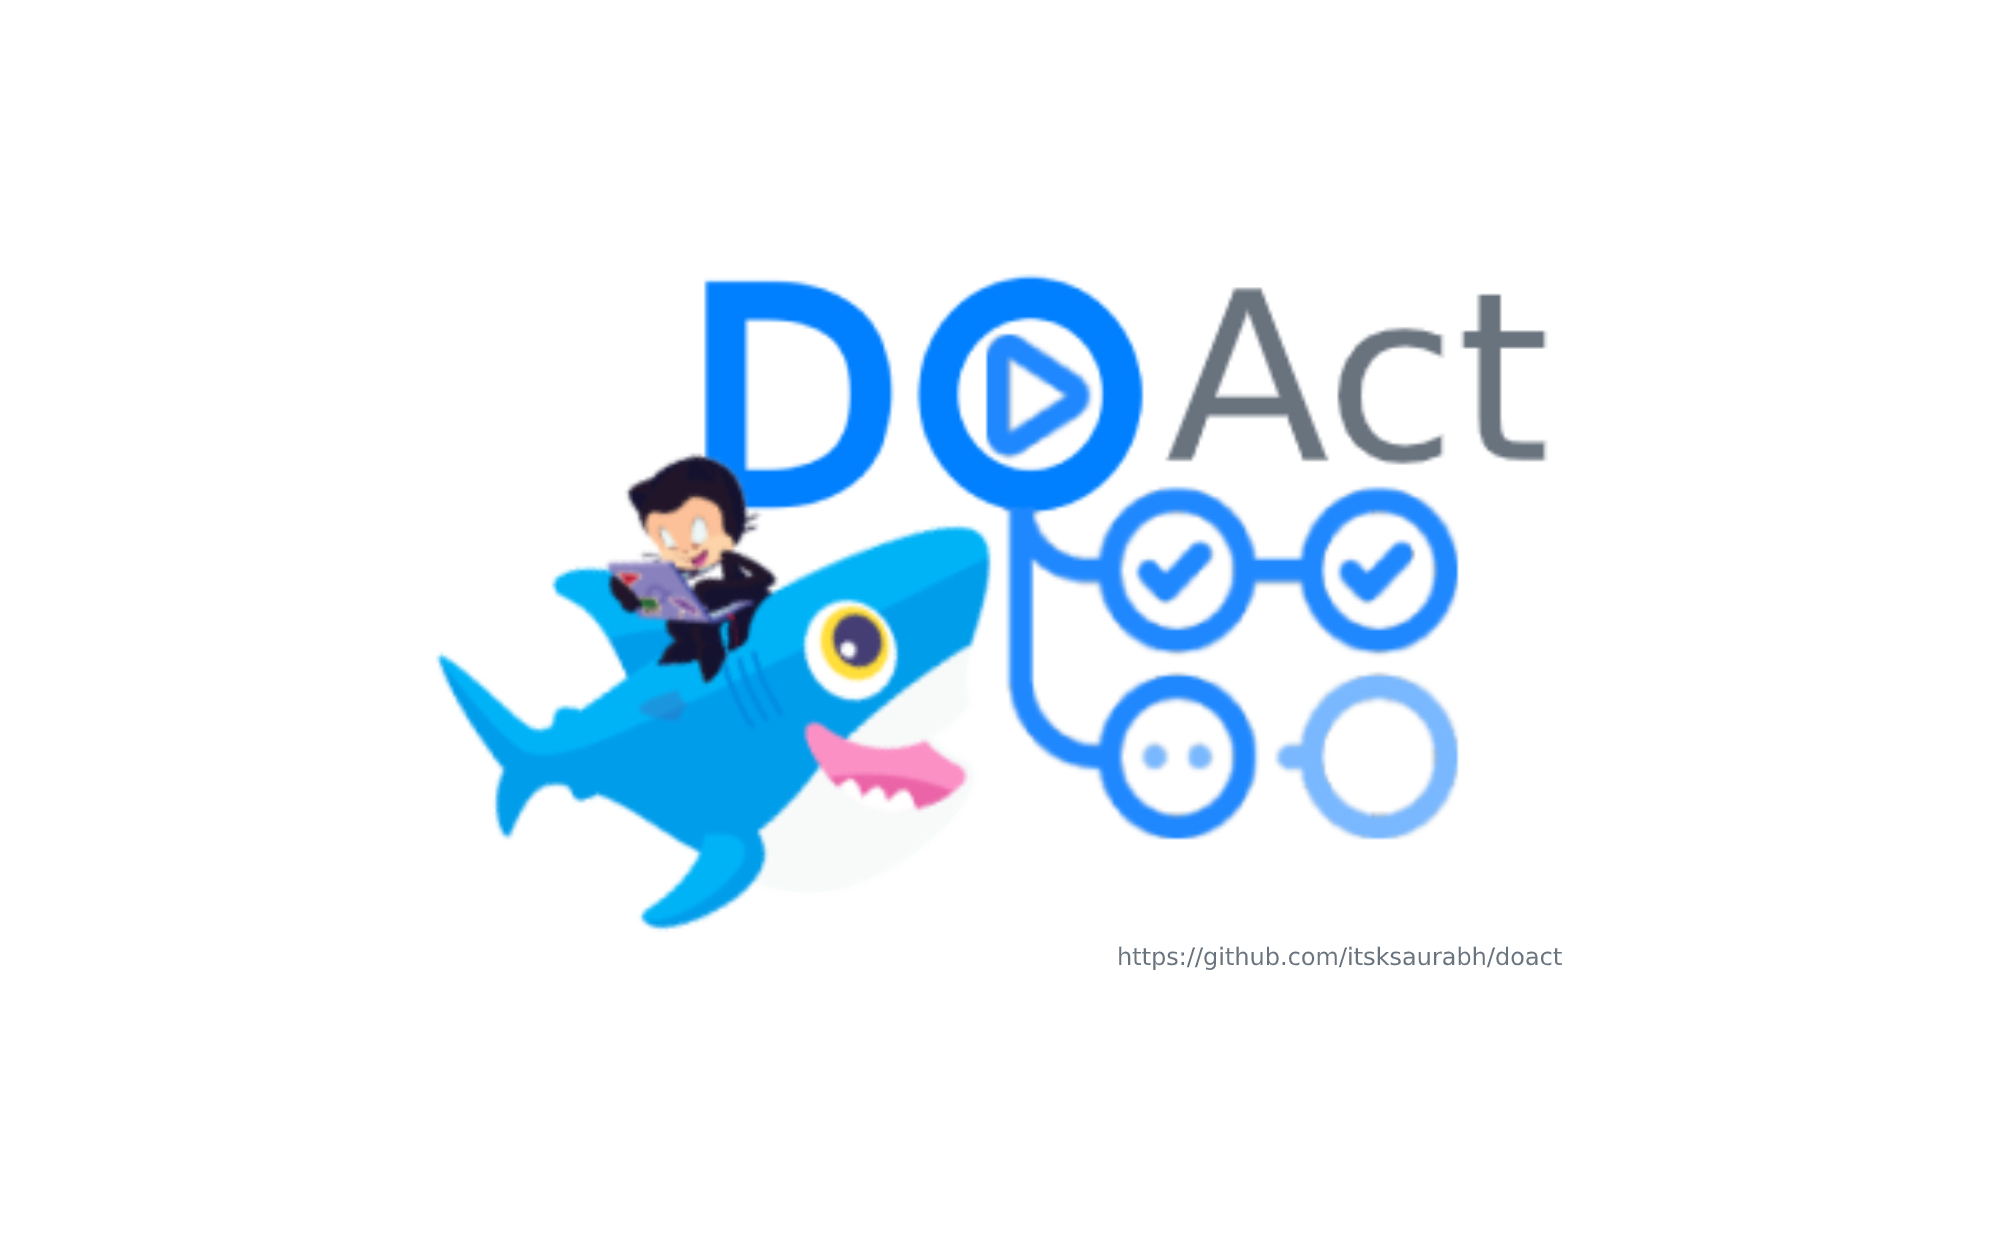 doact